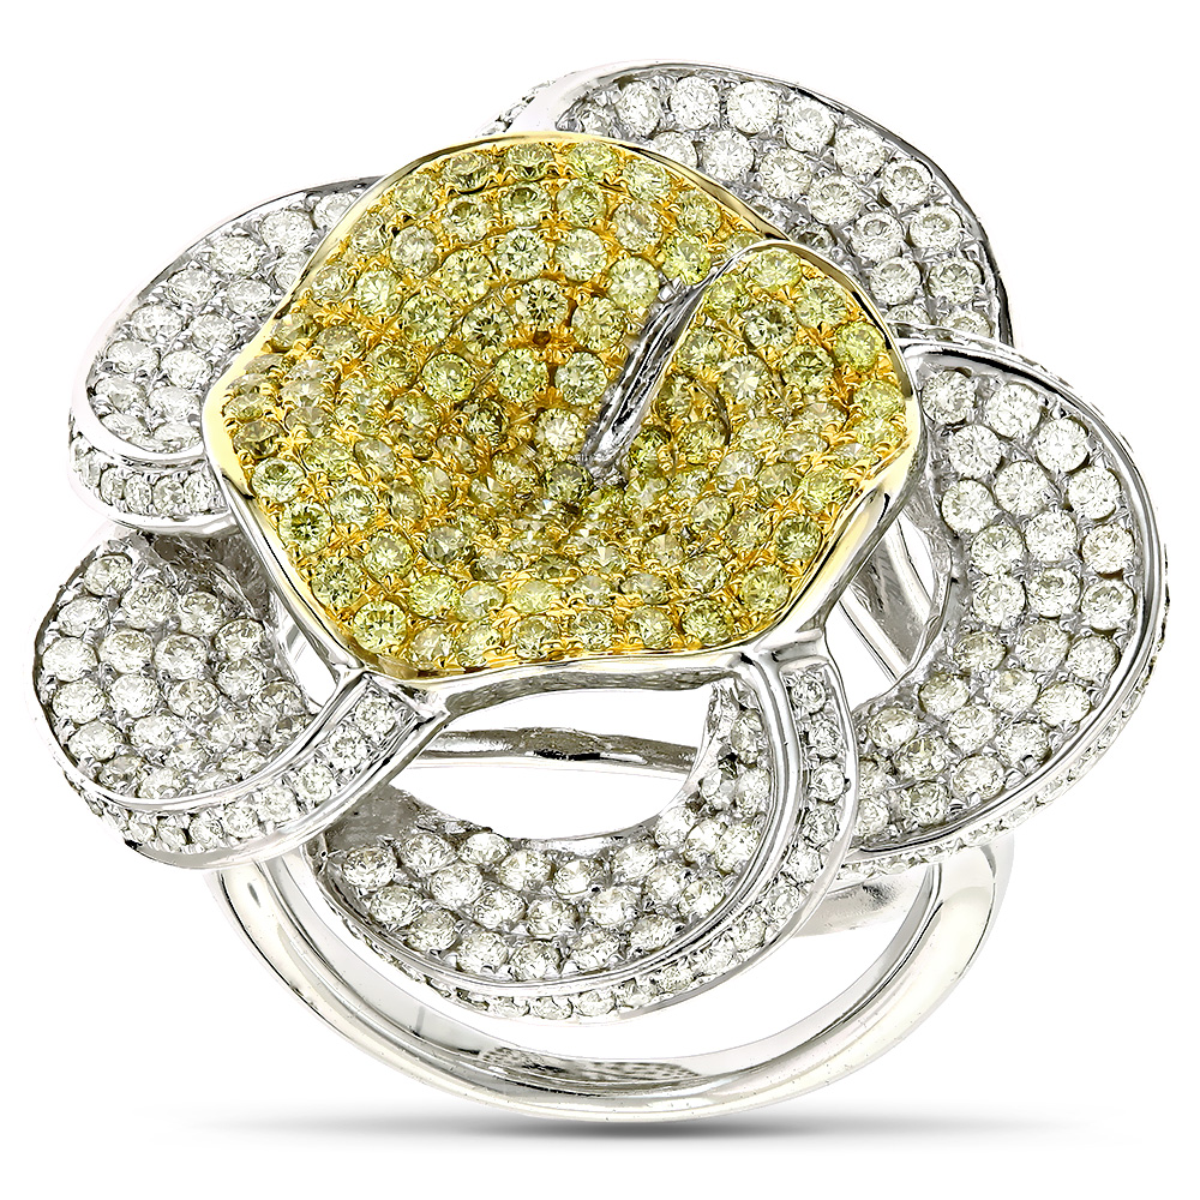 Gold Natural Yellow Diamond Flower Ring 14K 3.58ct